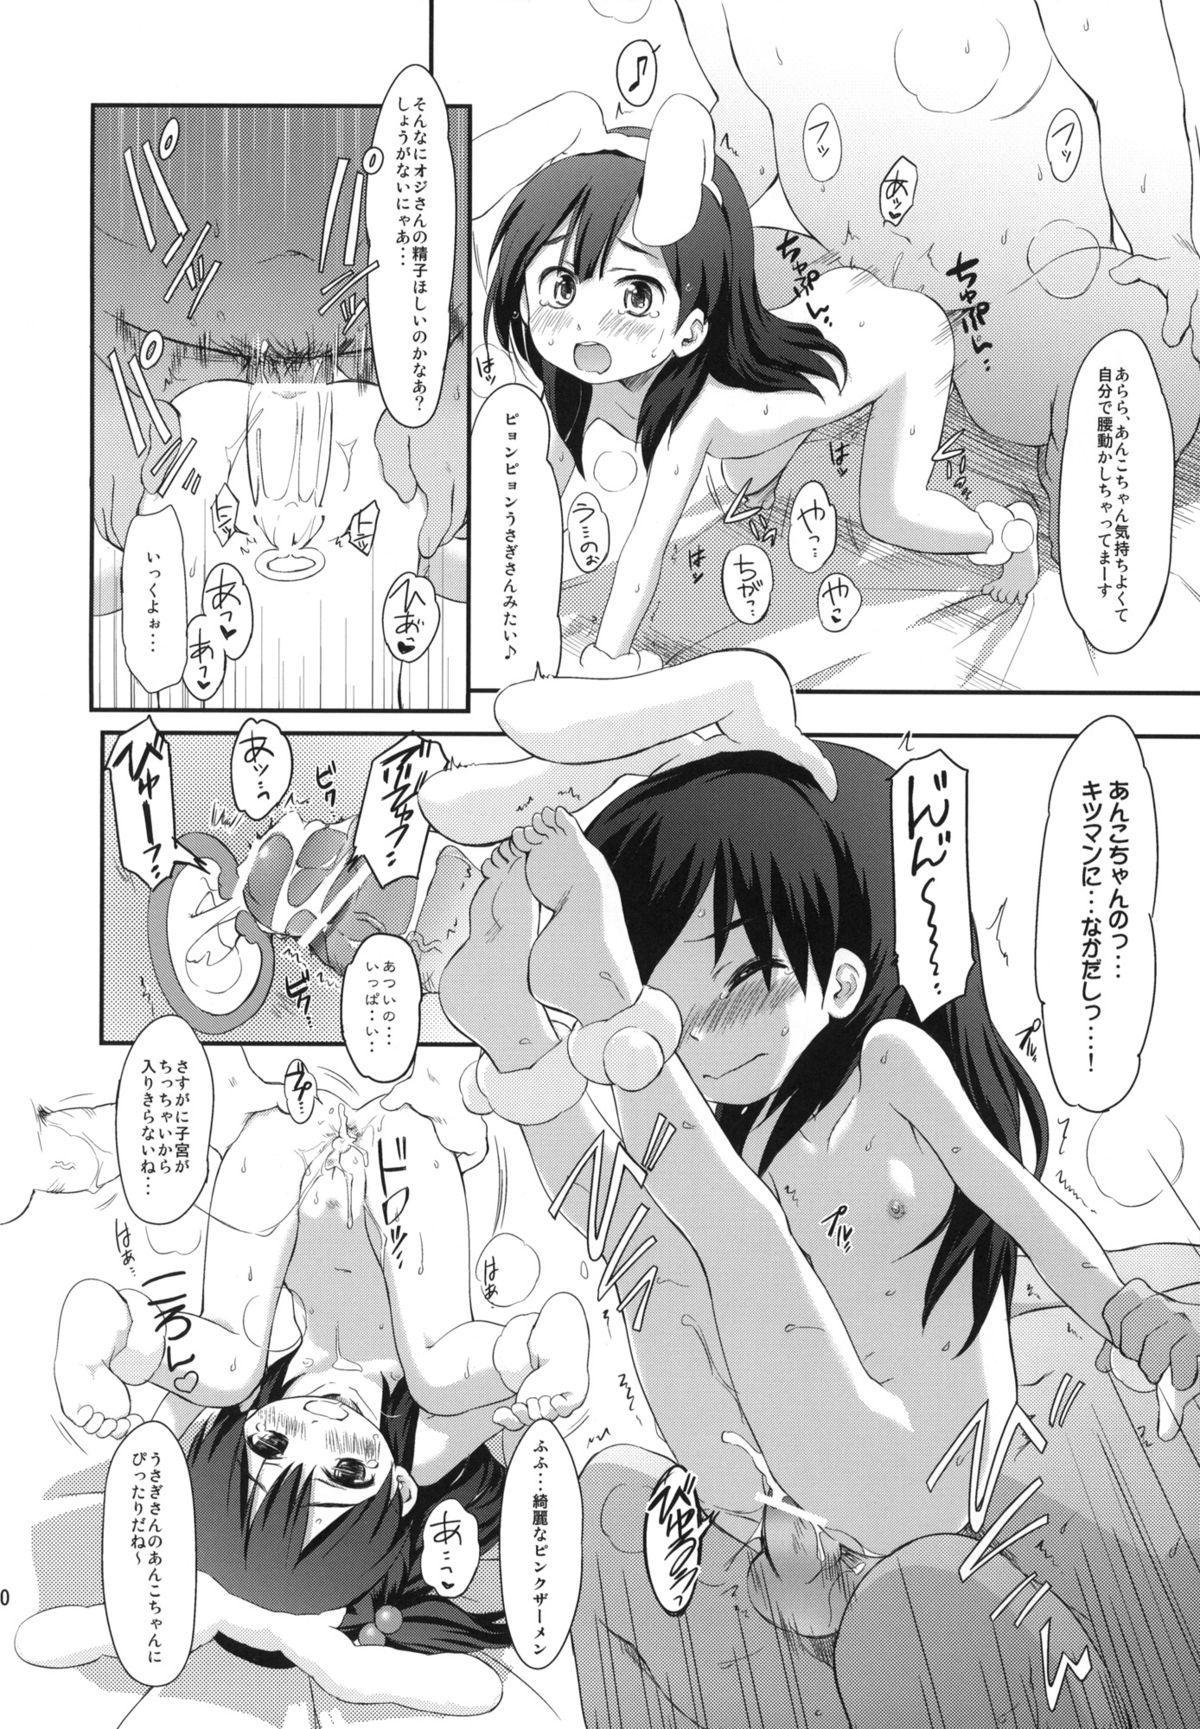 Usagiyama no Pet na Kanojo 8